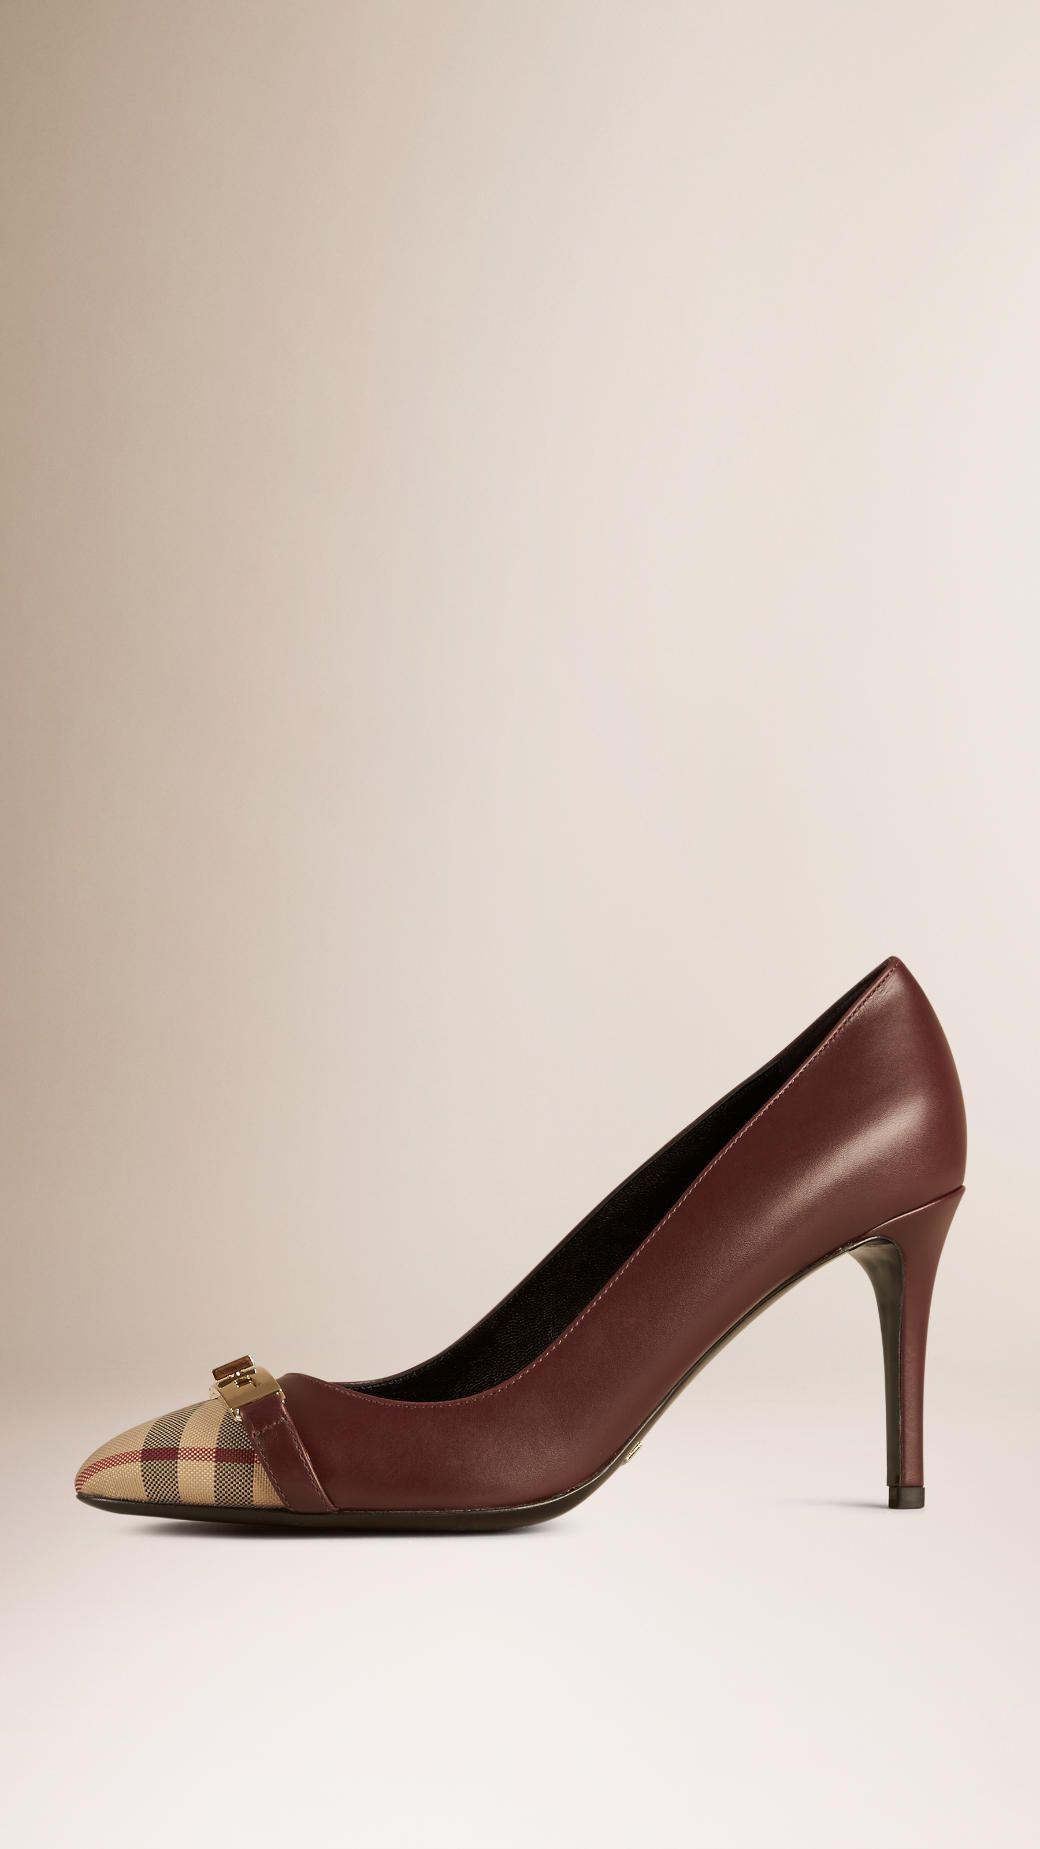 a74e1eb71bc Shoes for Women | Burberry | Shoes, Leather pumps, Brown pumps